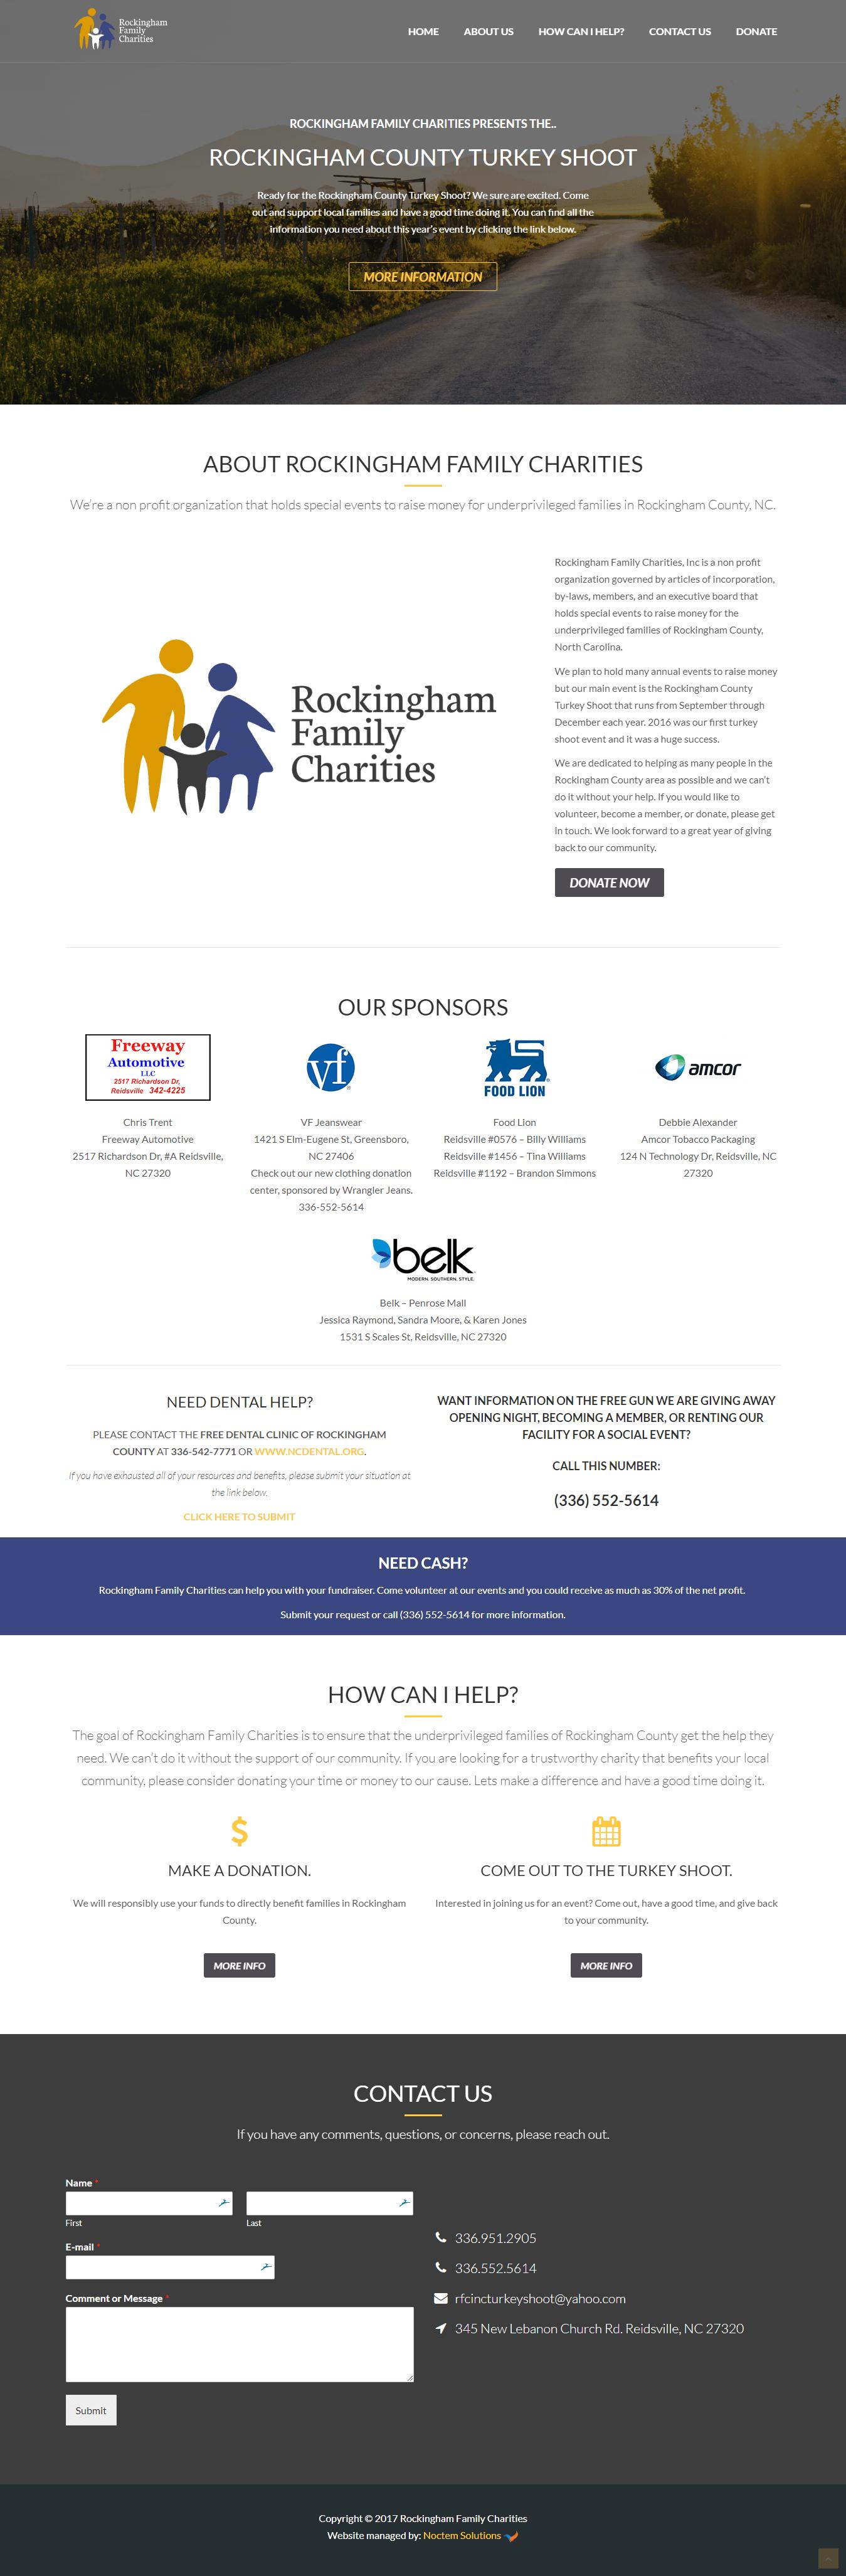 iMac with screenshot of Rockingham Family Charities website designed by Greensboro website design company Noctem Media.